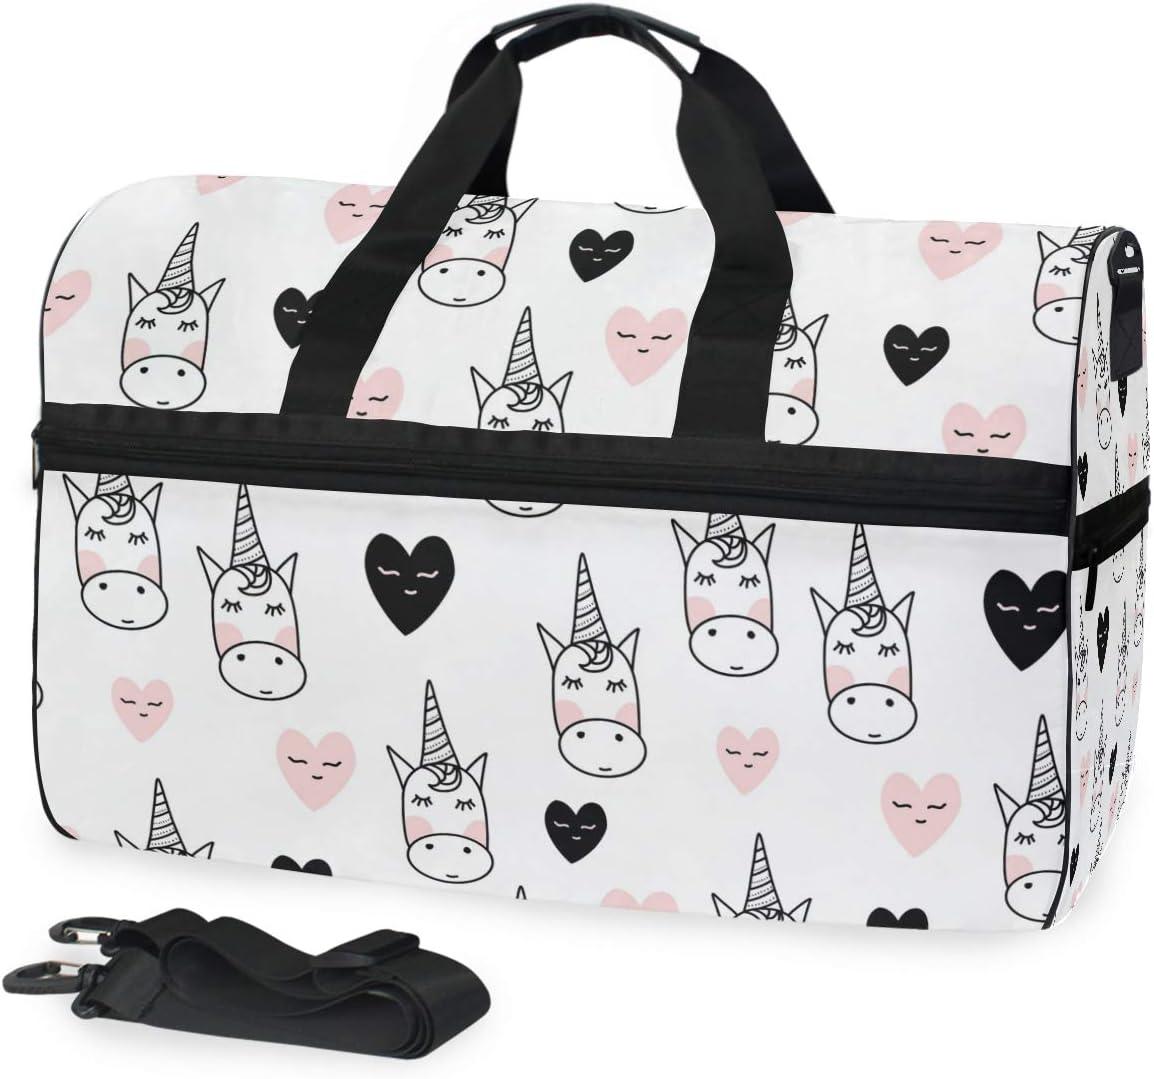 Travel Duffels Cute Unicorn Duffle Bag Luggage Sports Gym for Women /& Men